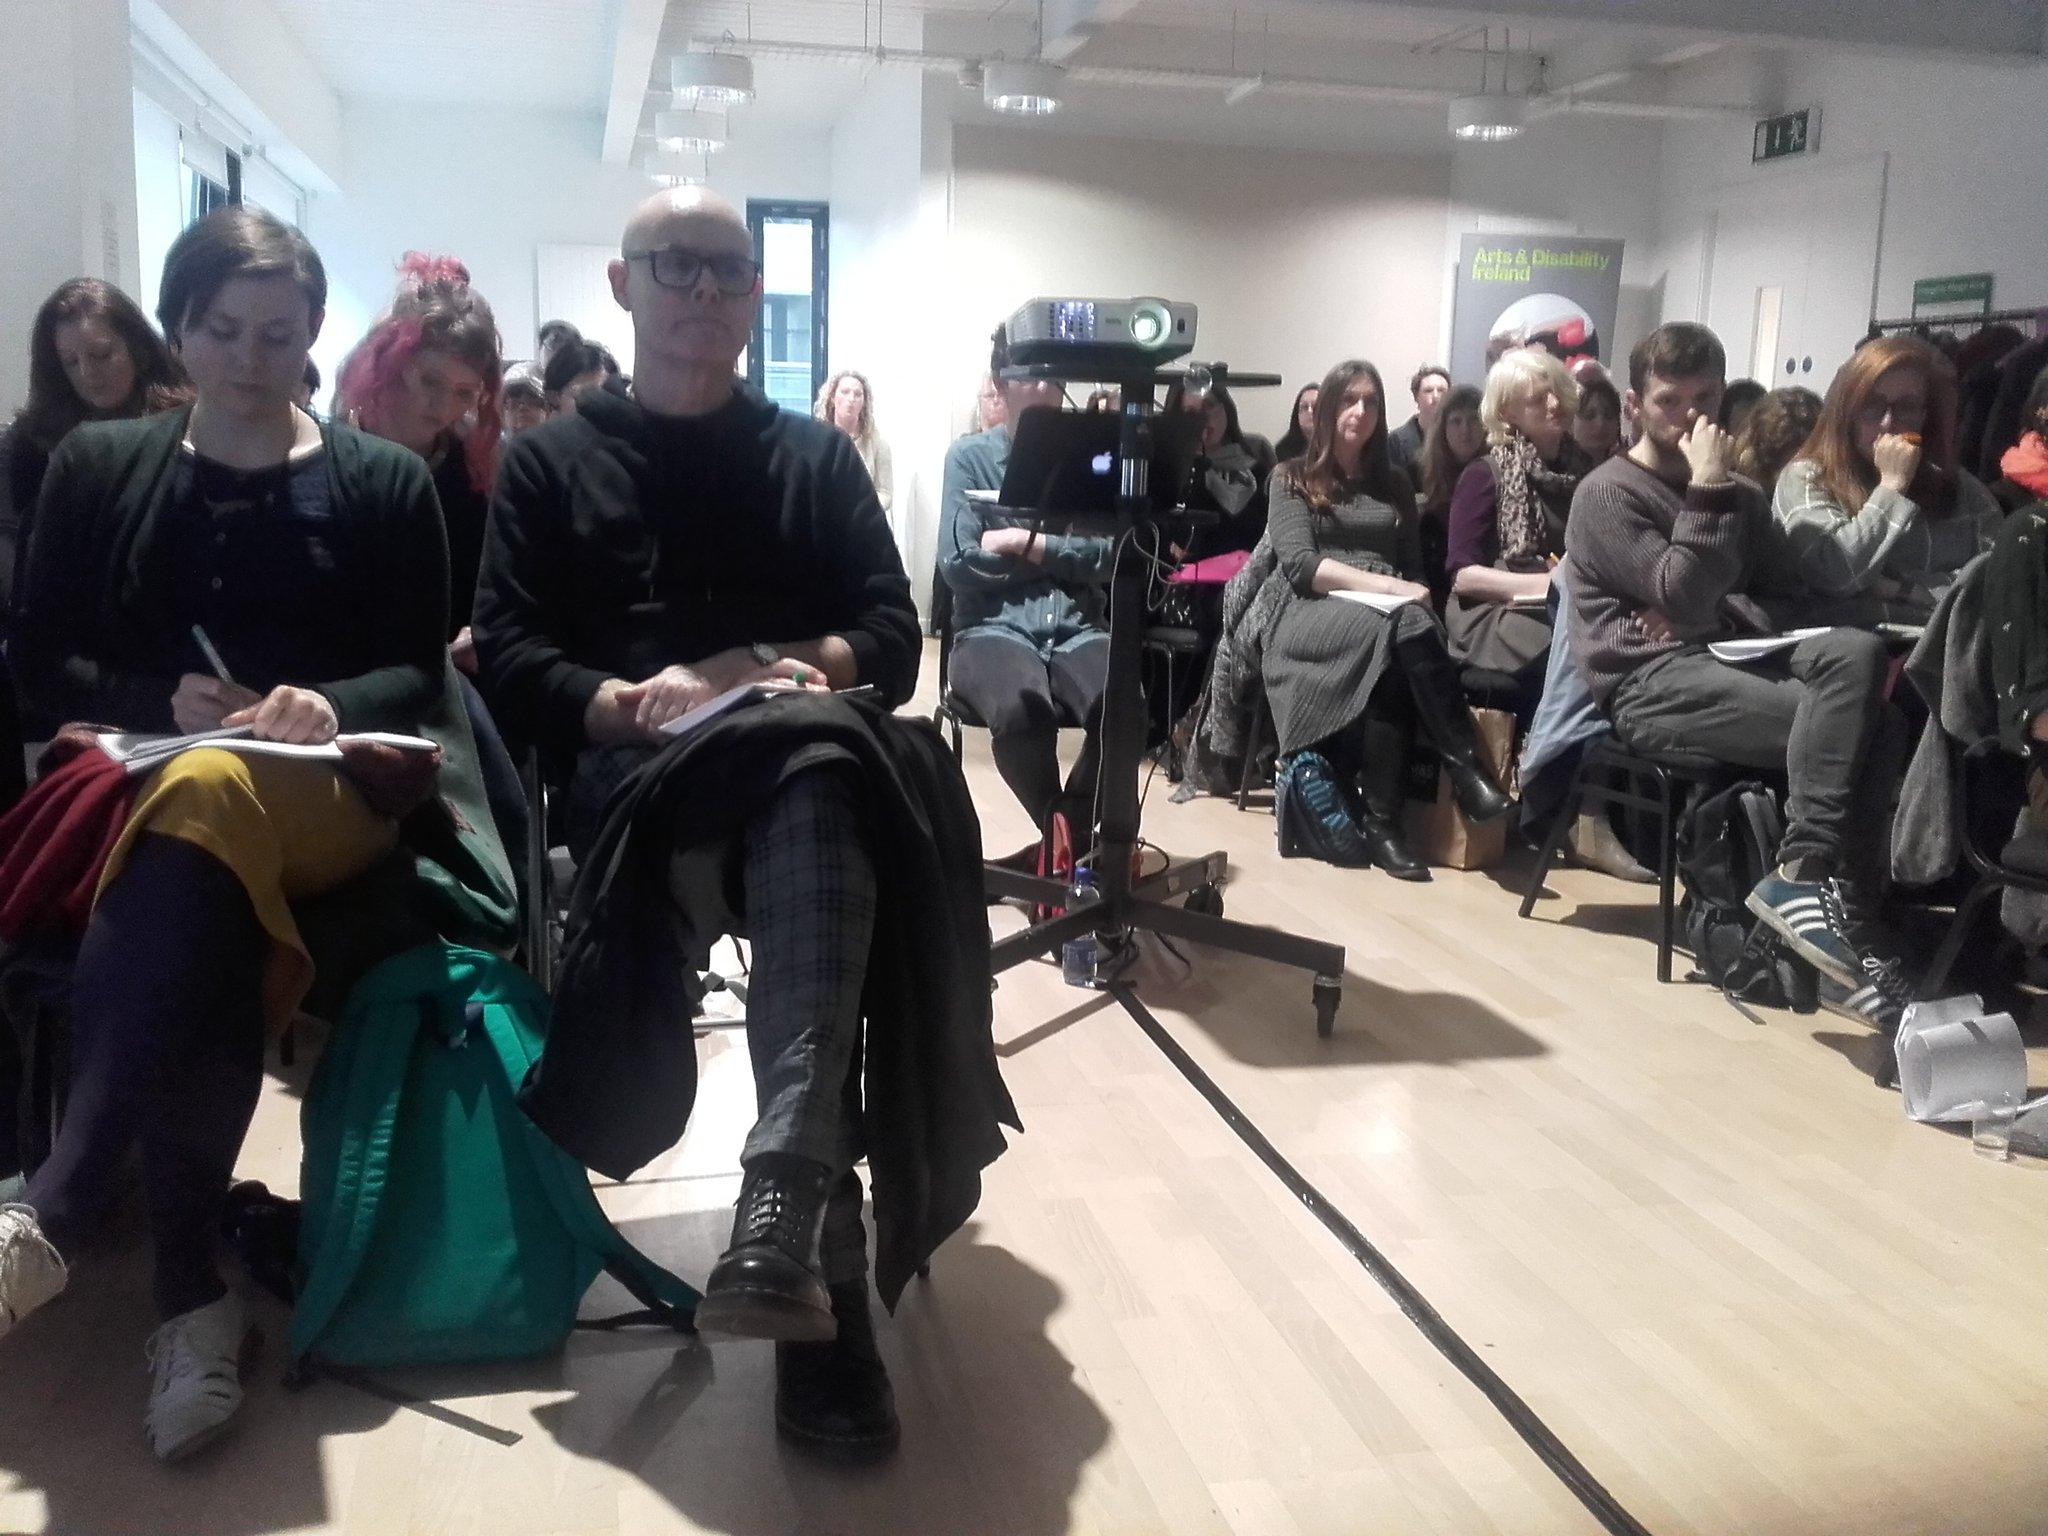 full house #aDifferentRepublic seminar @LabDCC presentations from Amanda Coogan, Suzanne Walshe and @AideenBarry @ADIarts @FSArtistStudios https://t.co/17O3LEJZsJ